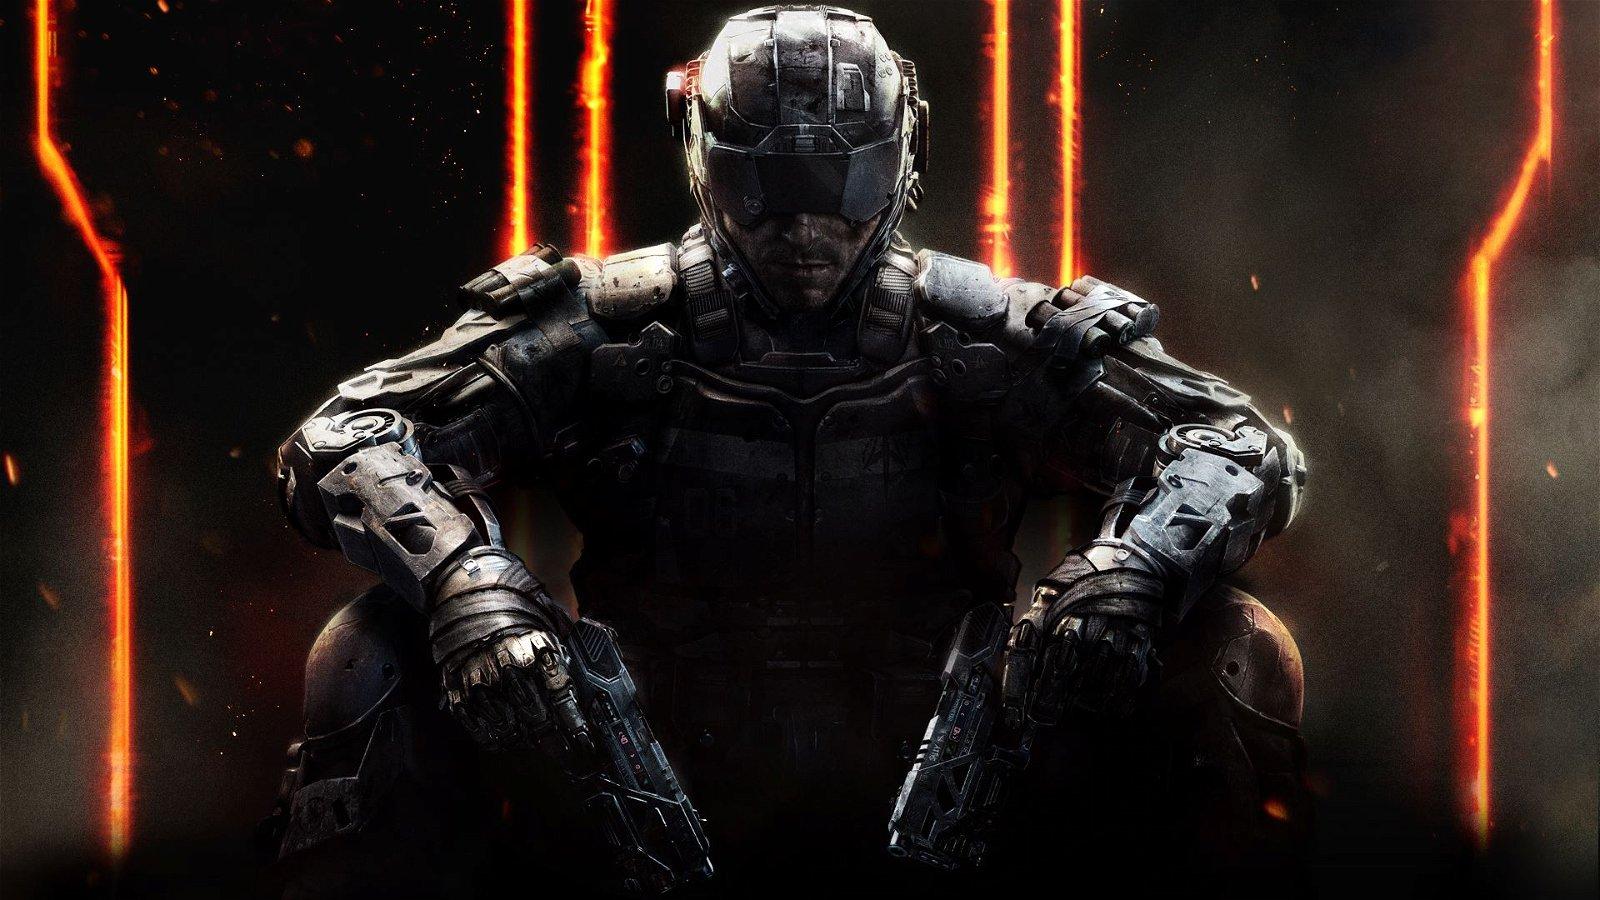 Call of Duty Black Ops 4 Confirmed Via Bizarre Clip of James Harden 1